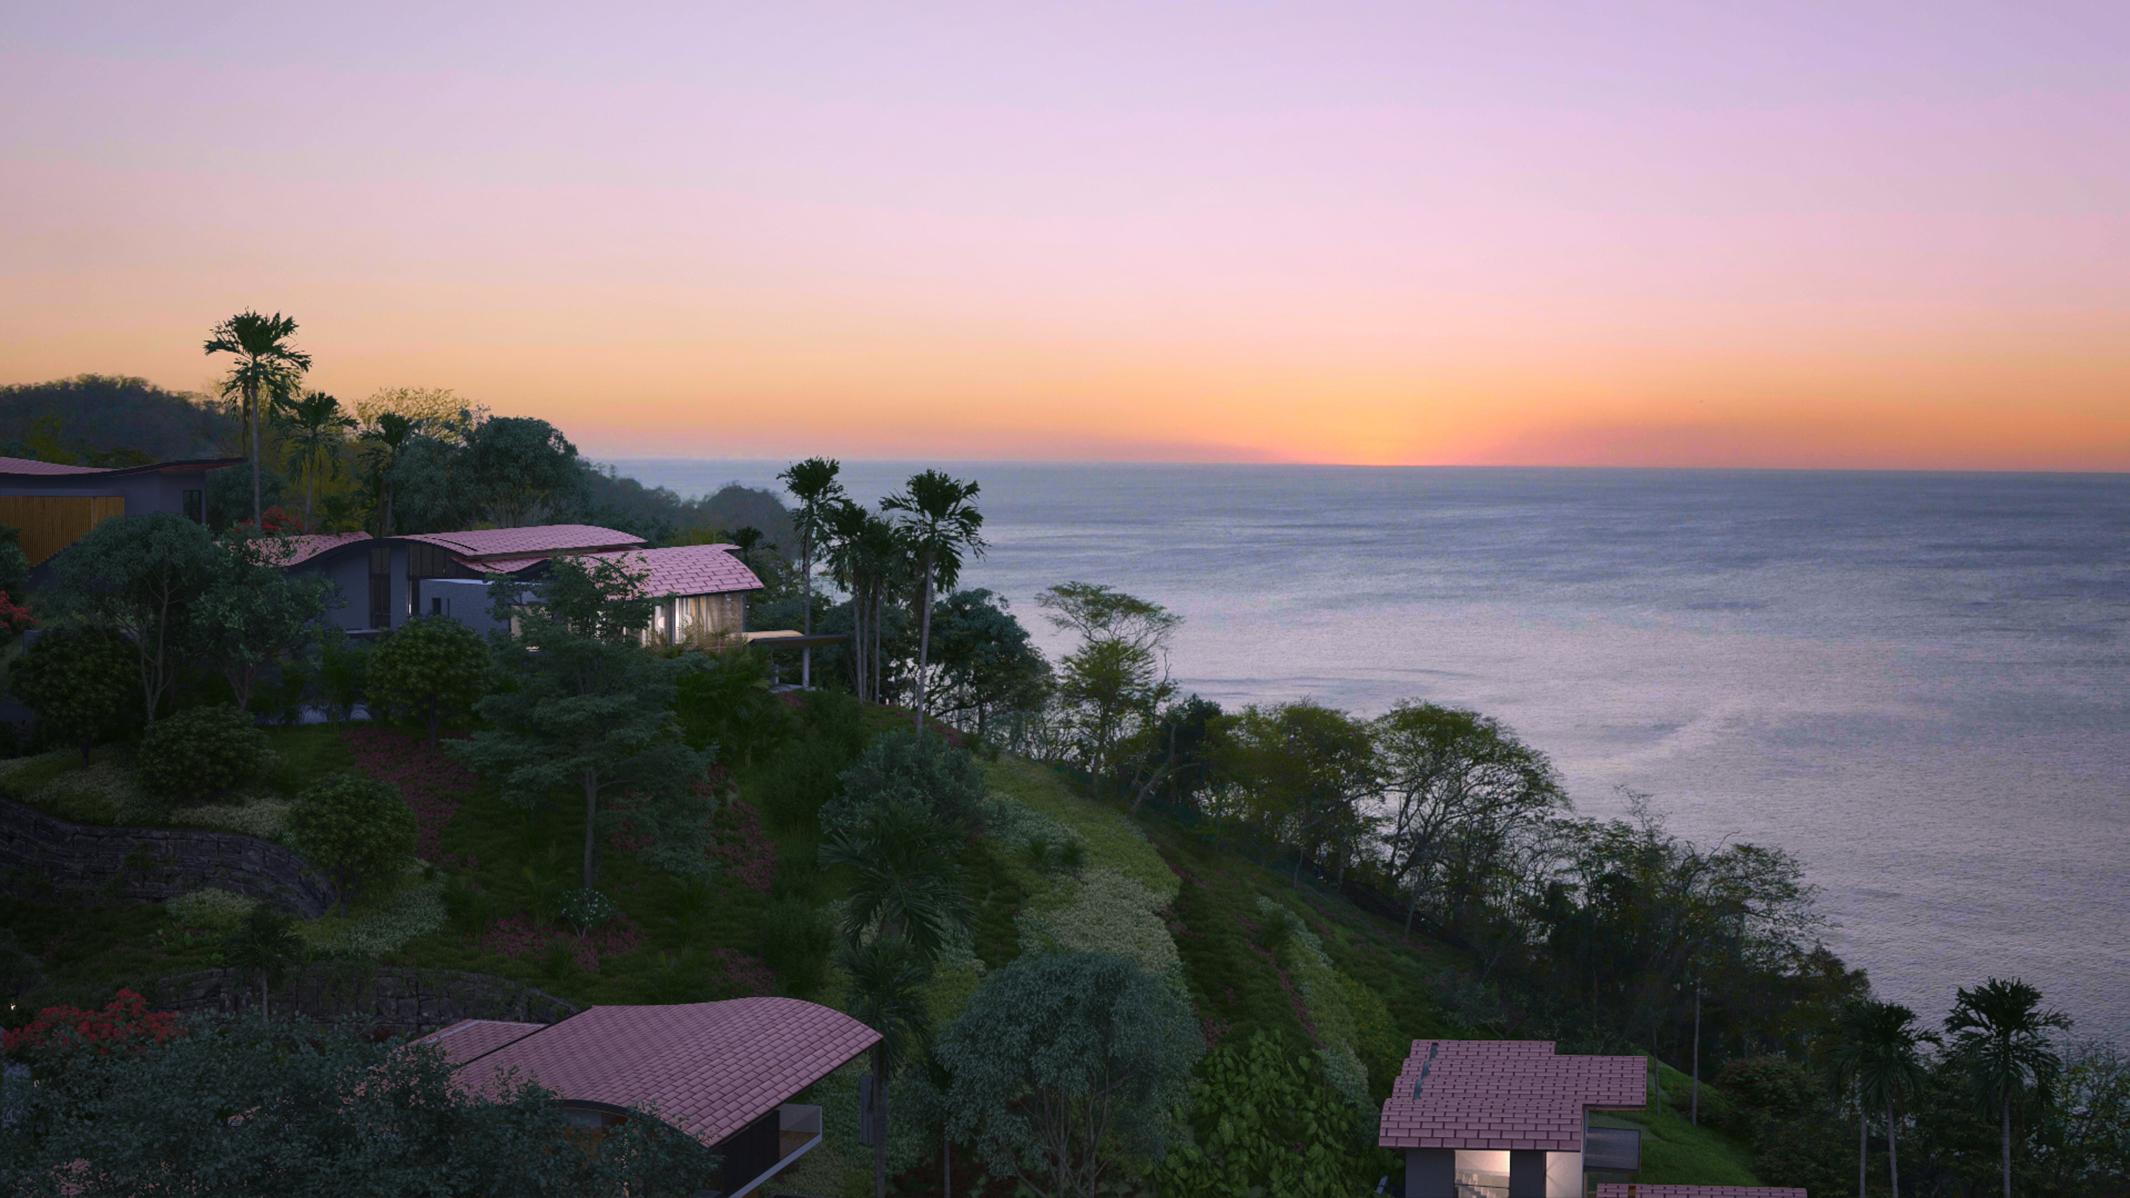 Sunset on Prieta Bay.